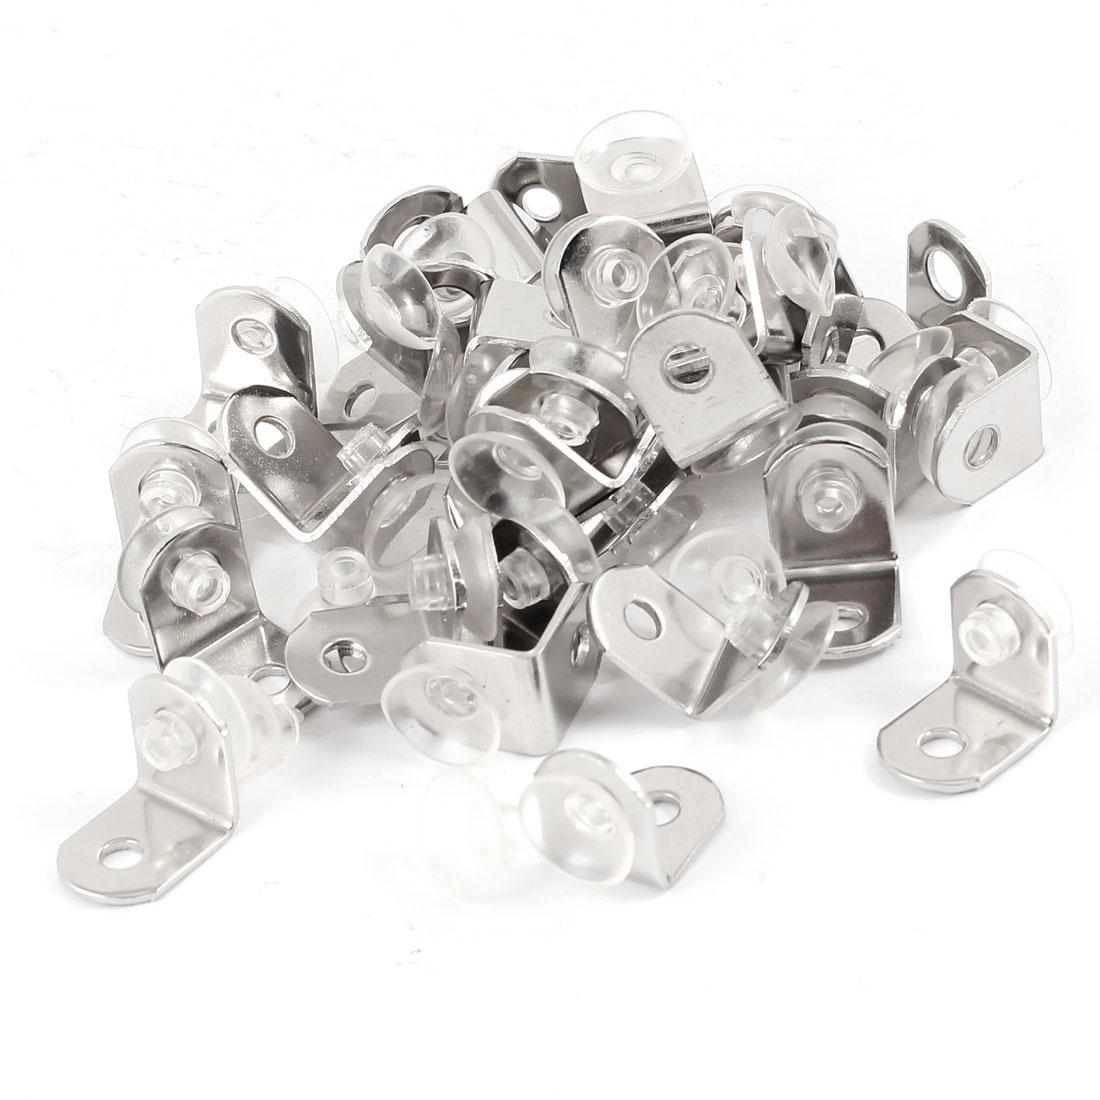 Suction Cup Base Right Angle Shelf Bracket Glass Shelve Support 40 Pcs